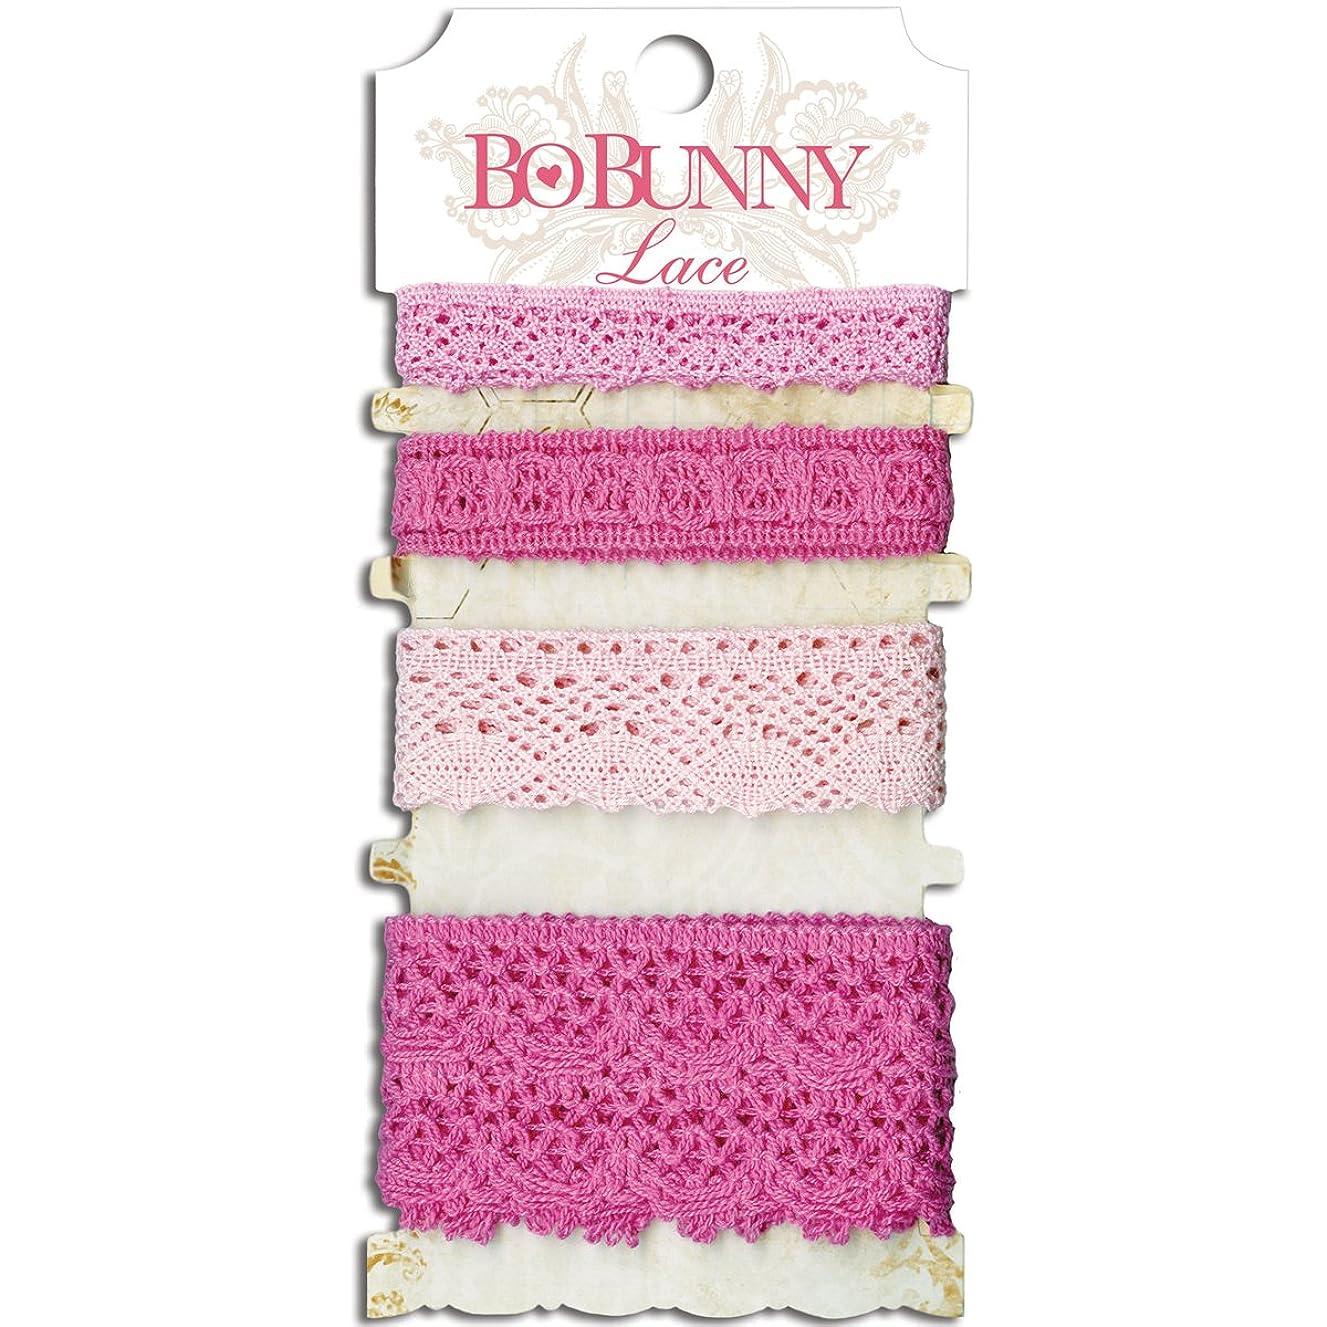 Bo Bunny Lace Trim 4 Styles 2.25yds-Blush